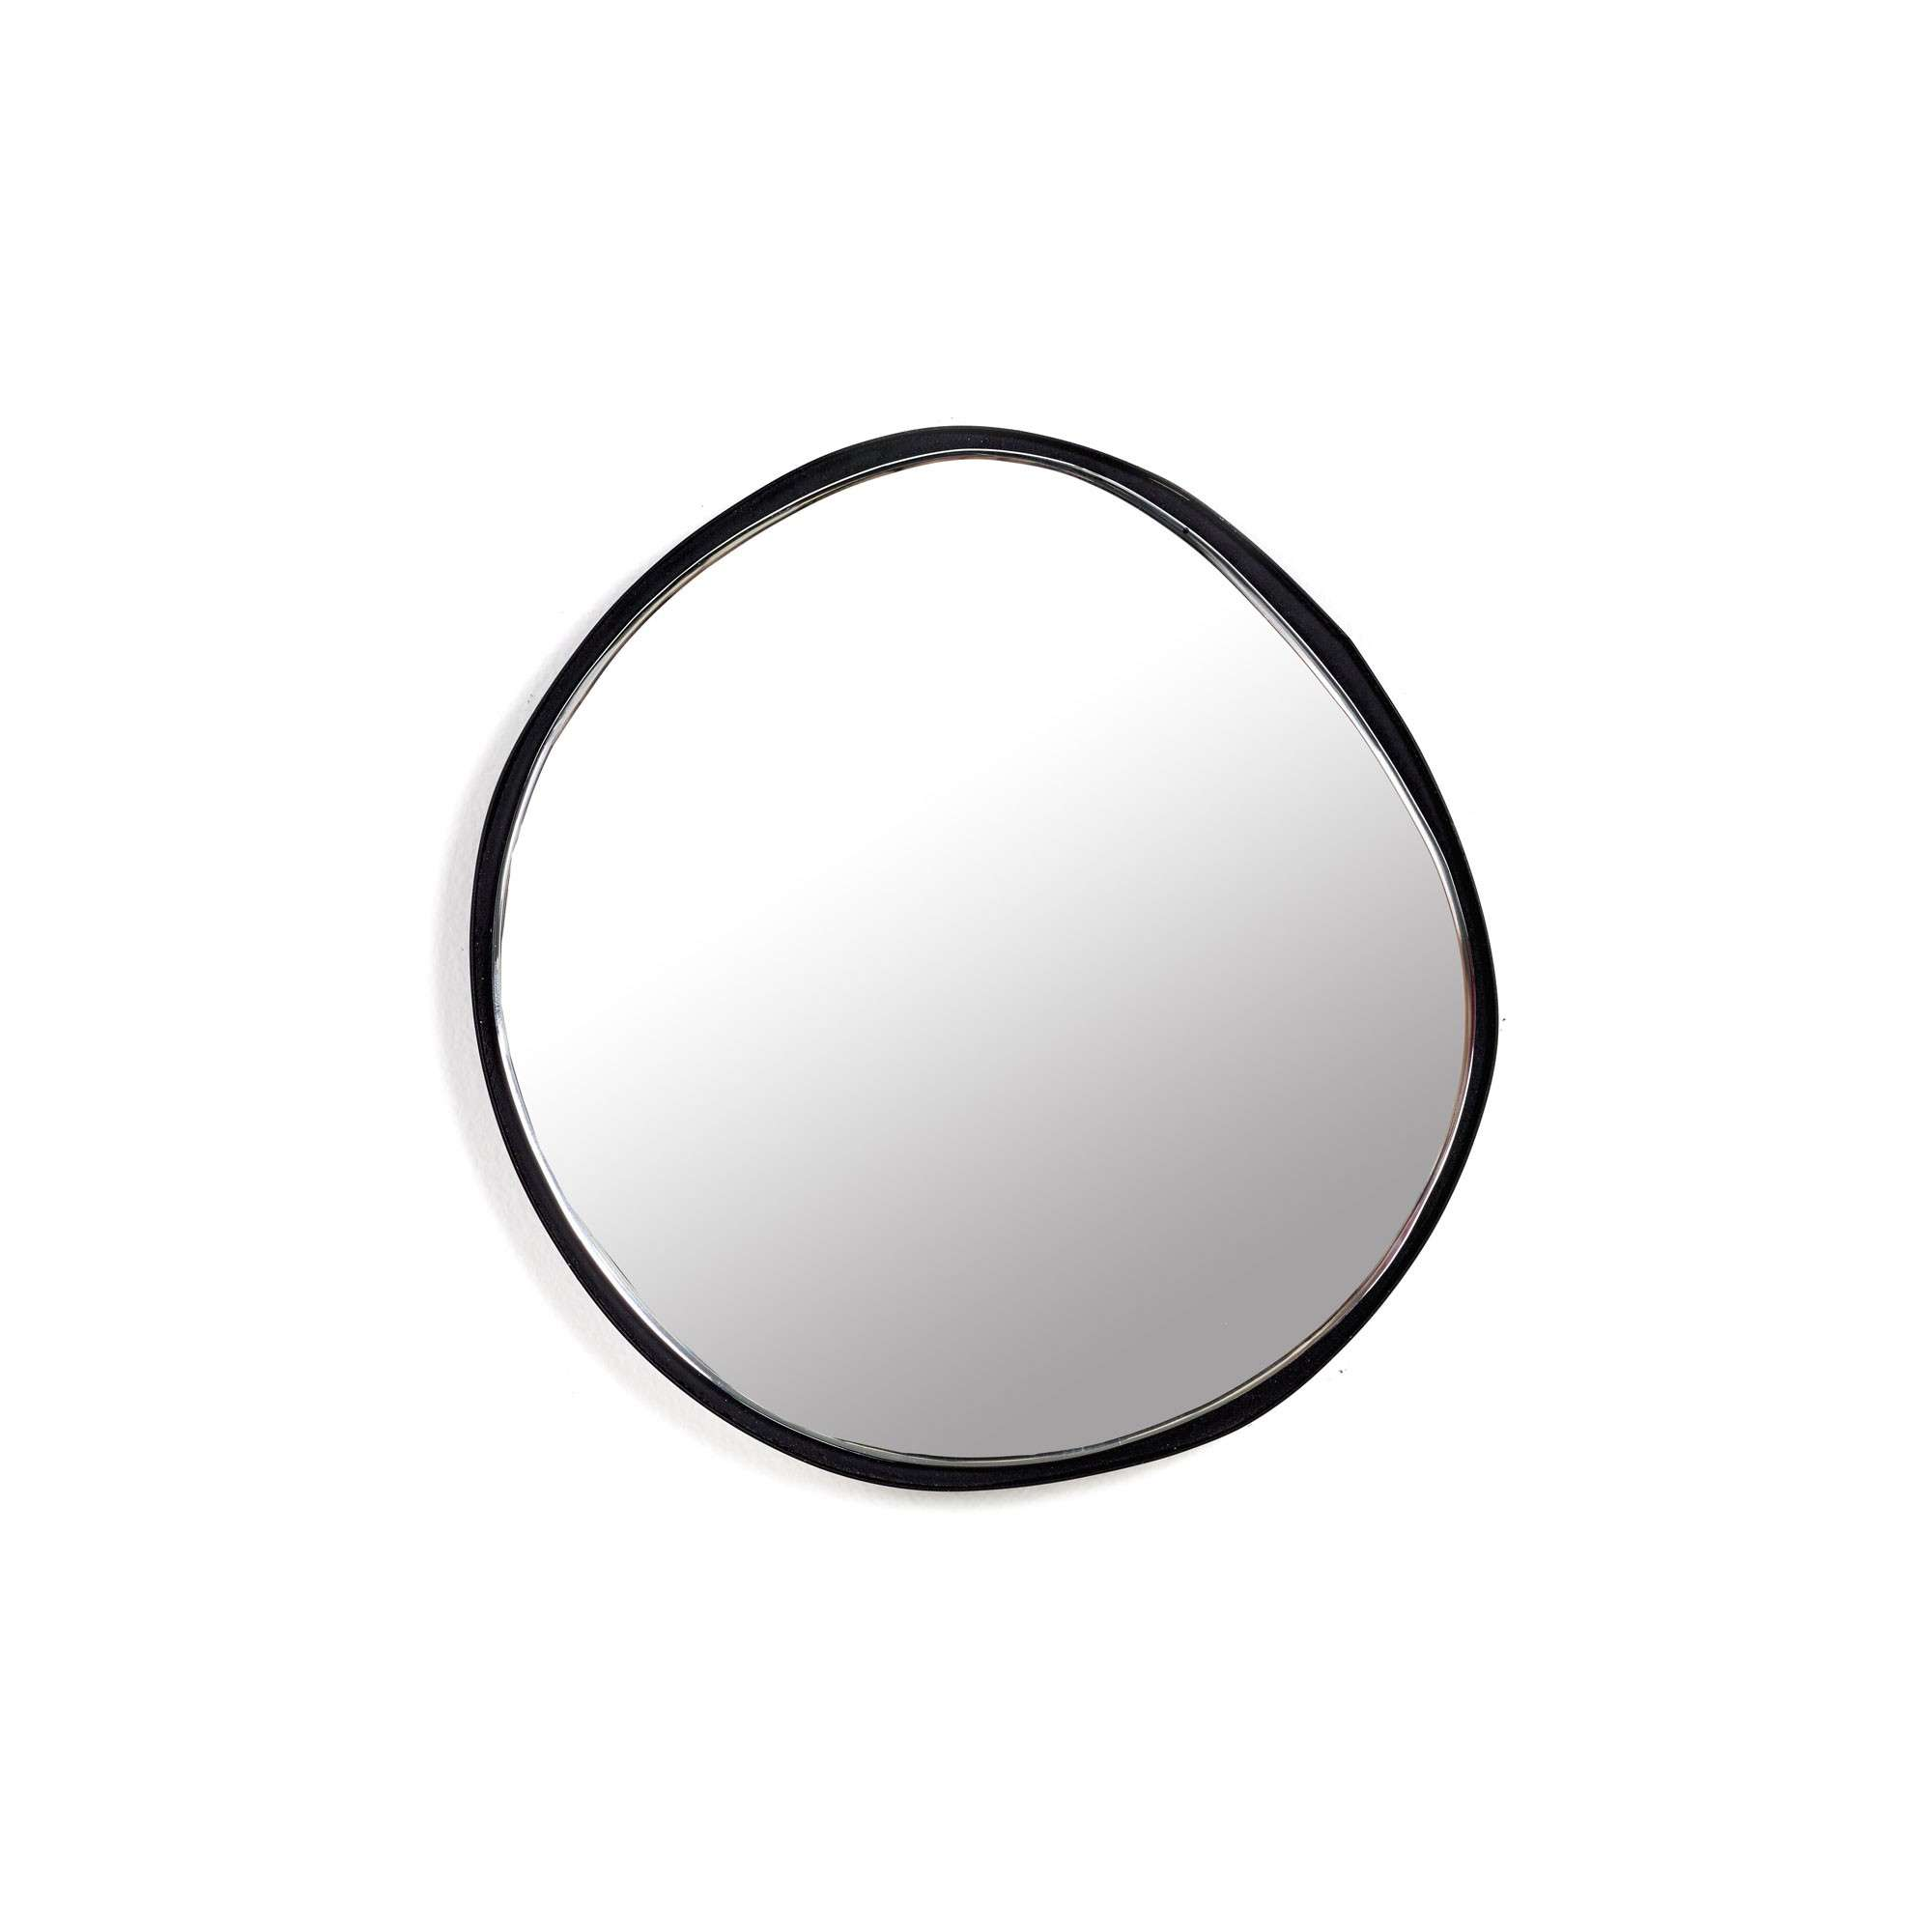 serax miroir mirror a cadre noir 21 5 cm. Black Bedroom Furniture Sets. Home Design Ideas